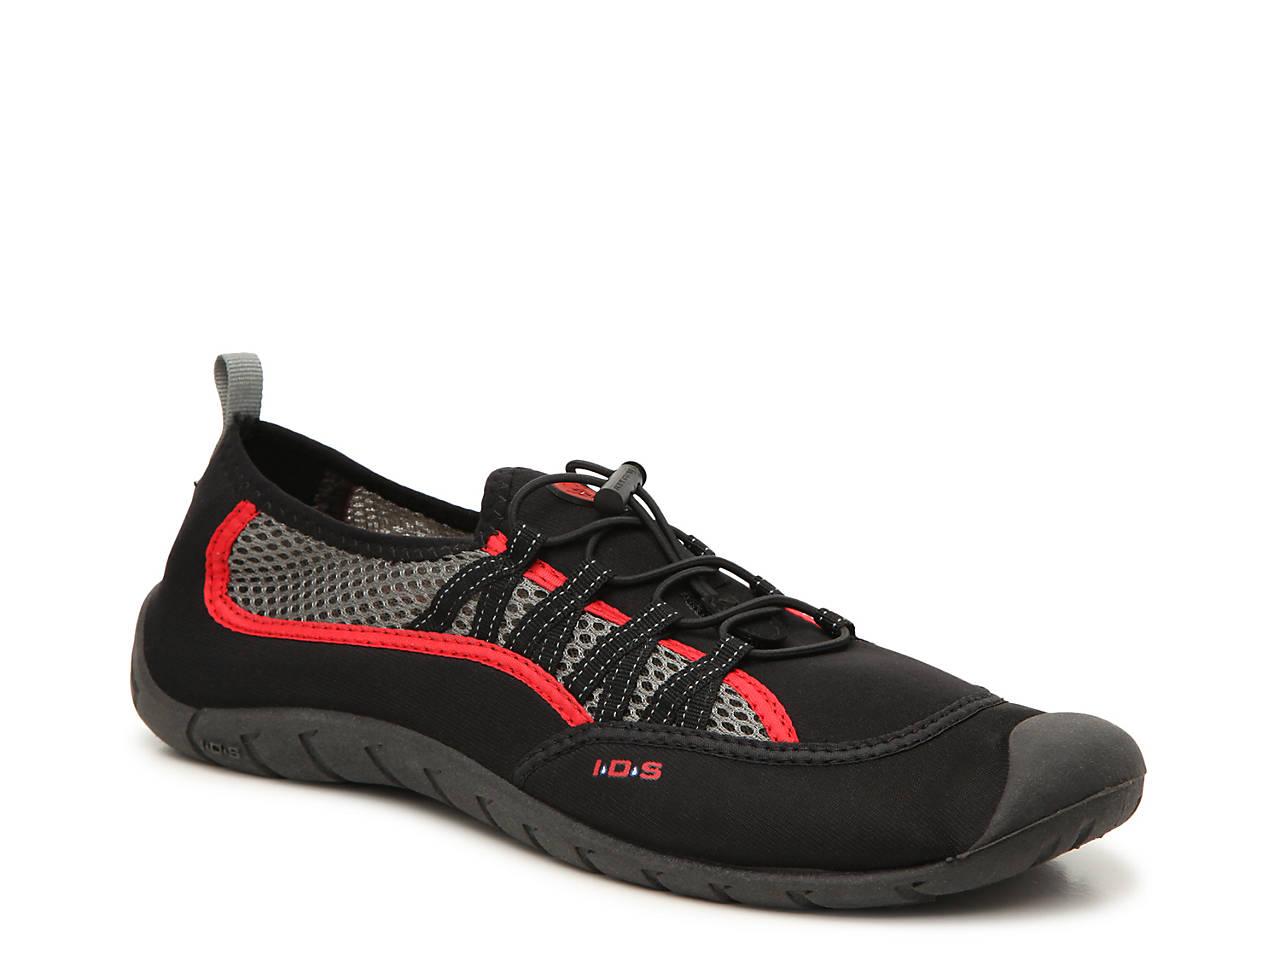 f437896e4cdd Body Glove Sidewinder Water Shoe Men s Shoes